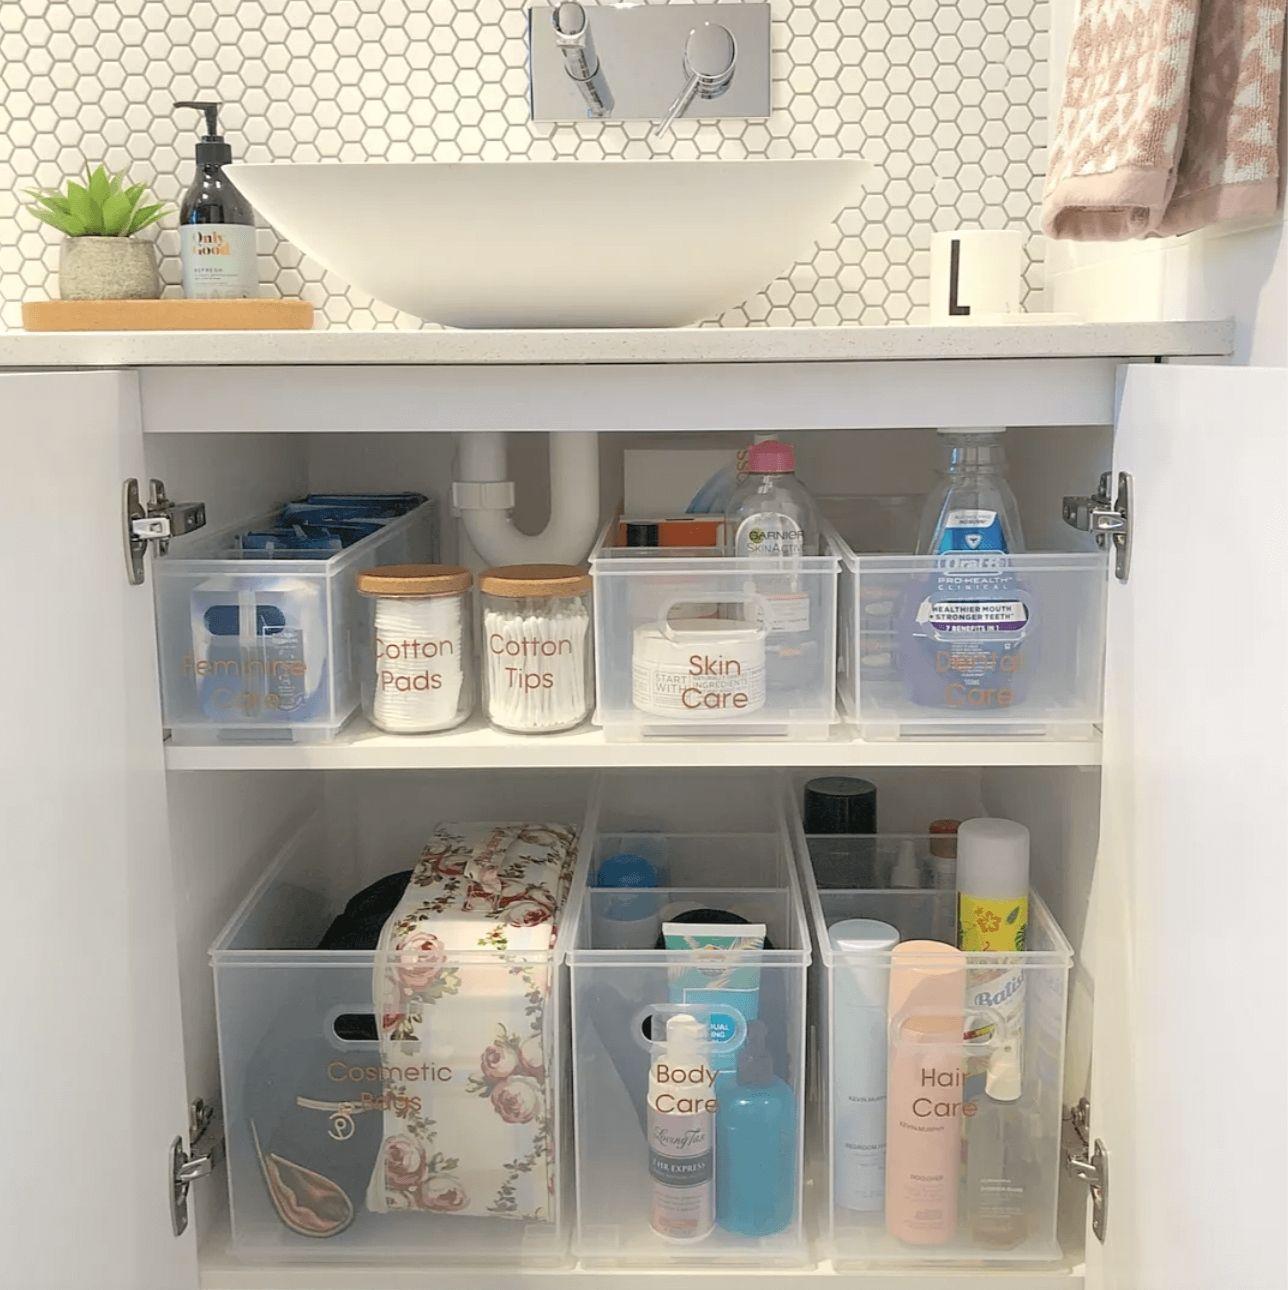 Bathroom storage basket organizers